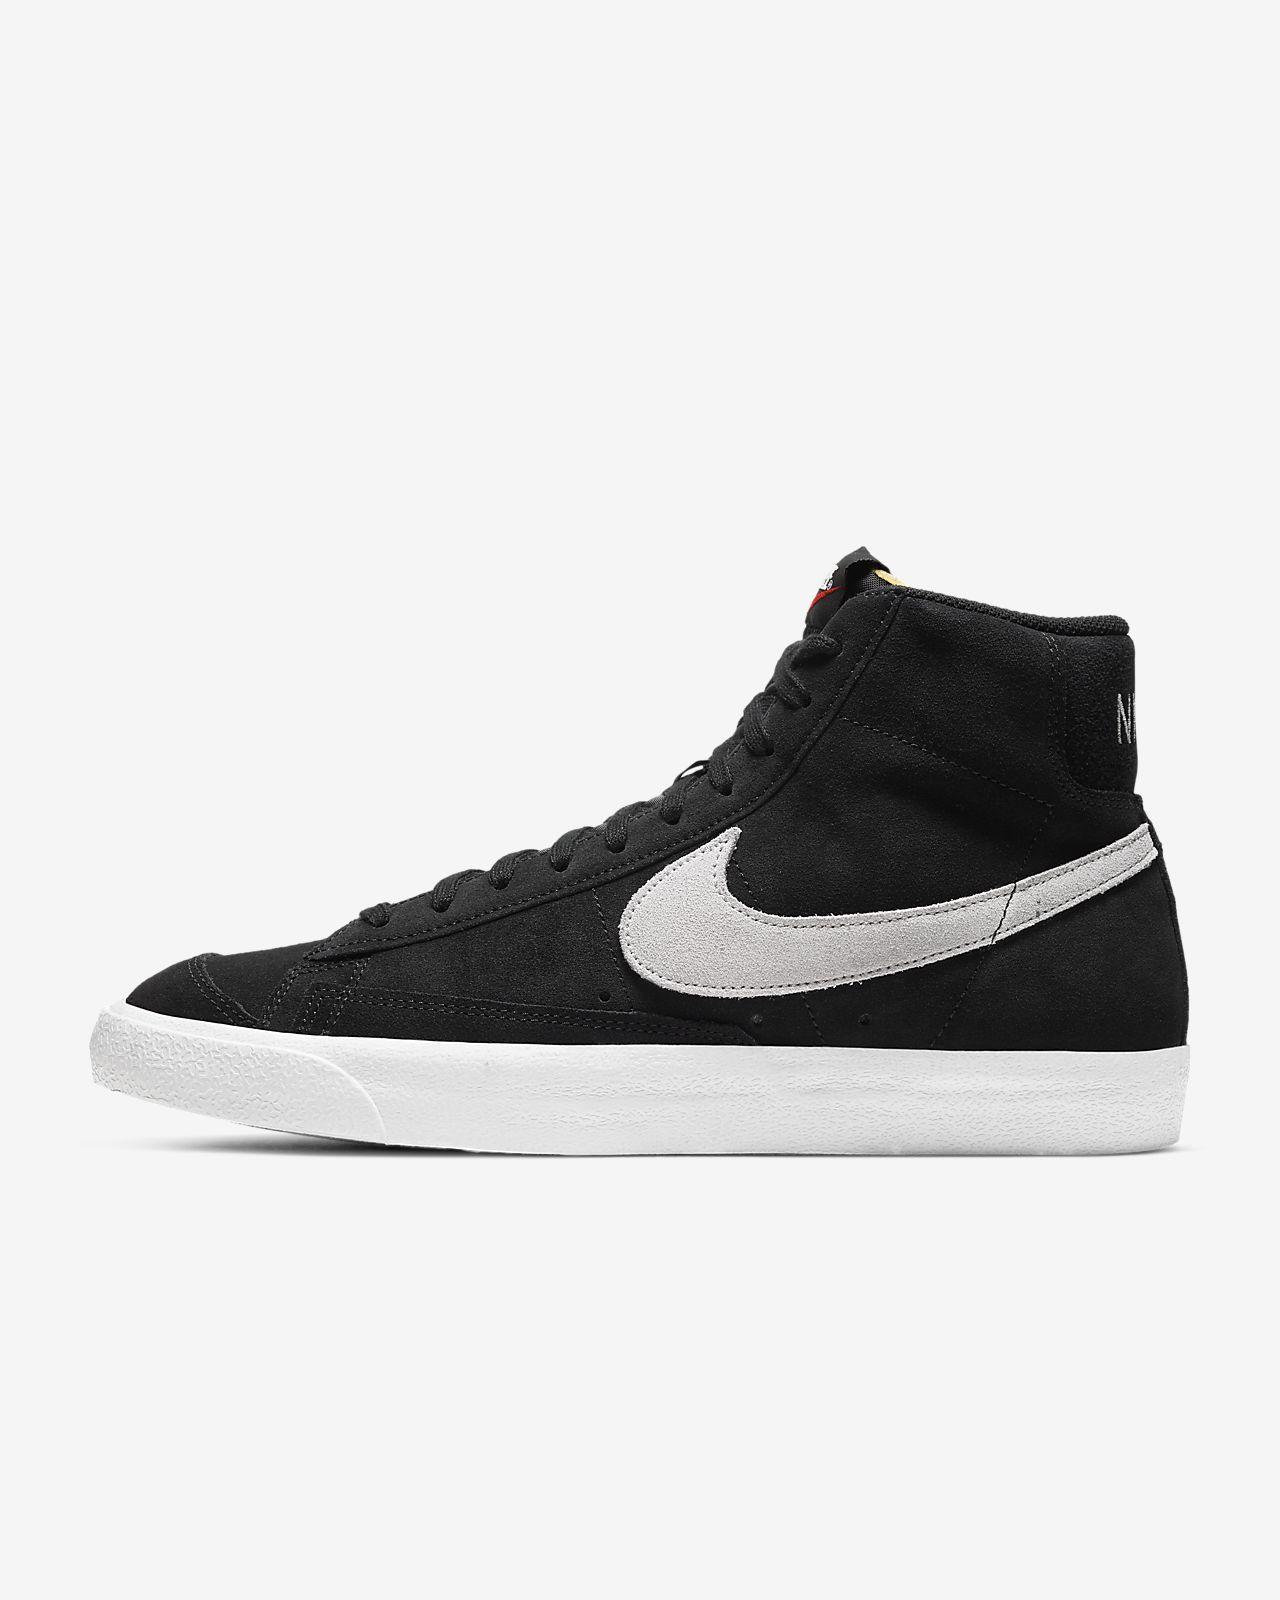 Nike Blazer Mid '77 Suede Schoen